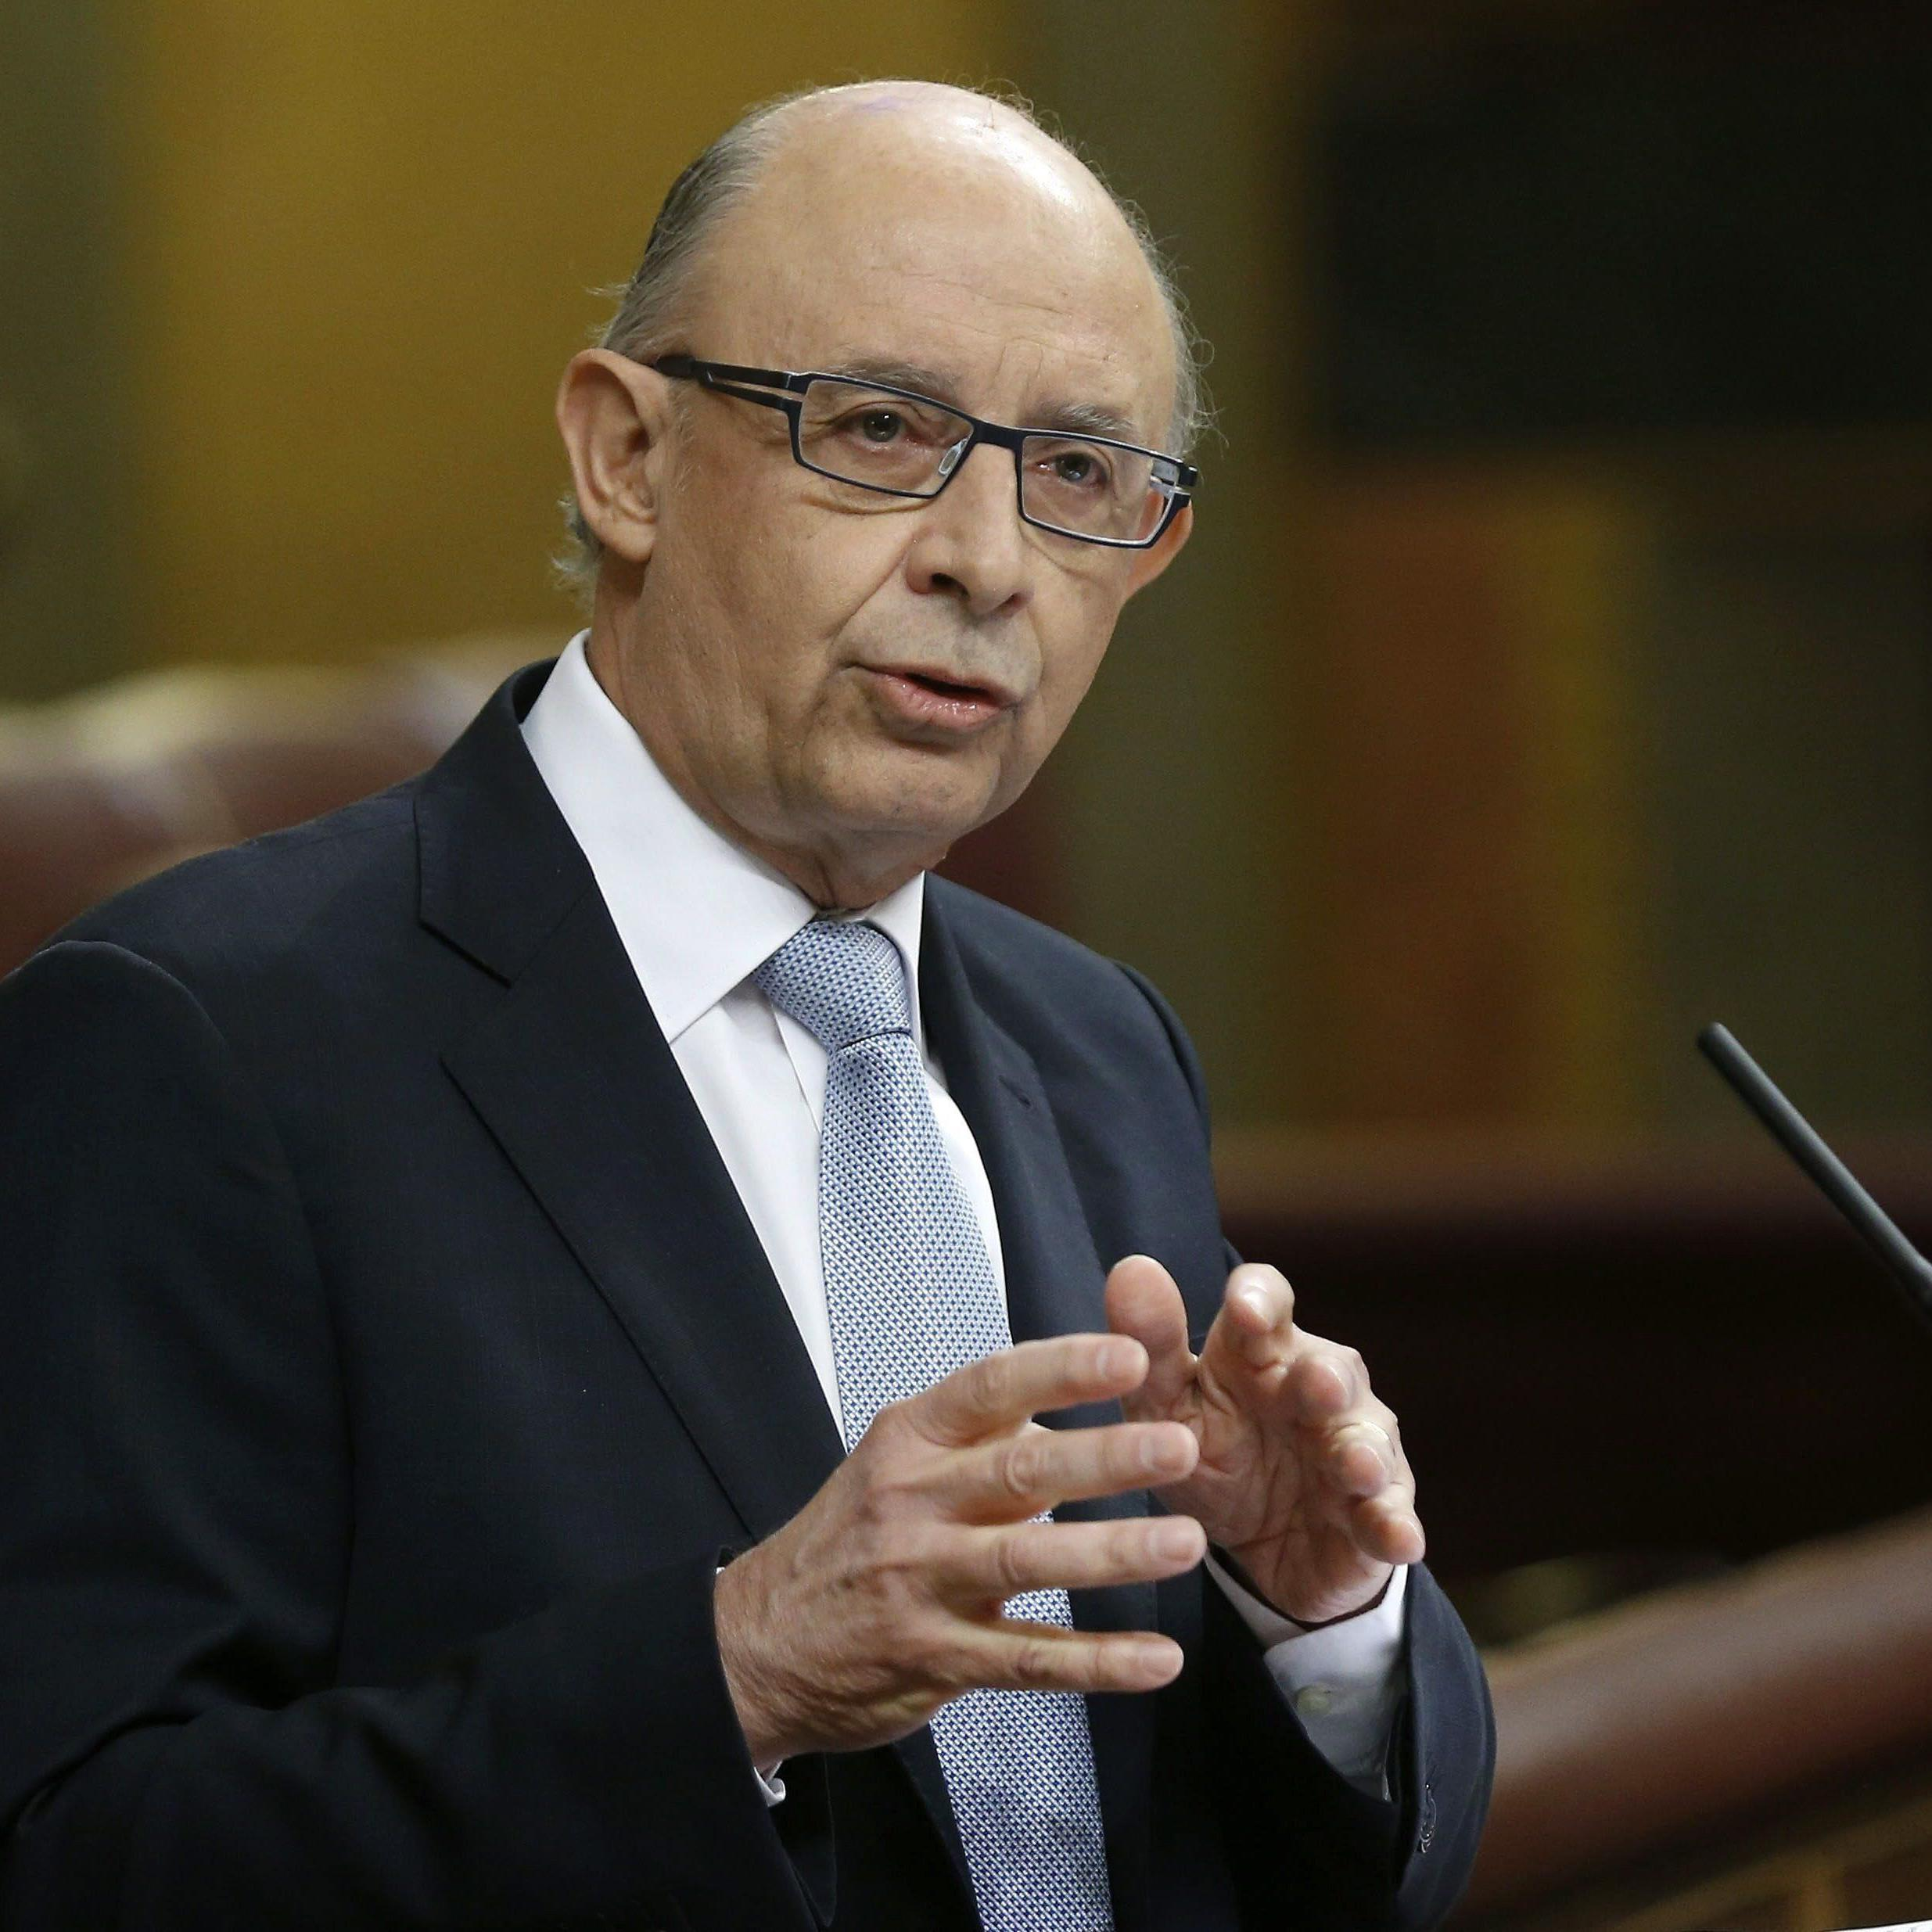 Spanien nach Tadel aus Brüssel verärgert